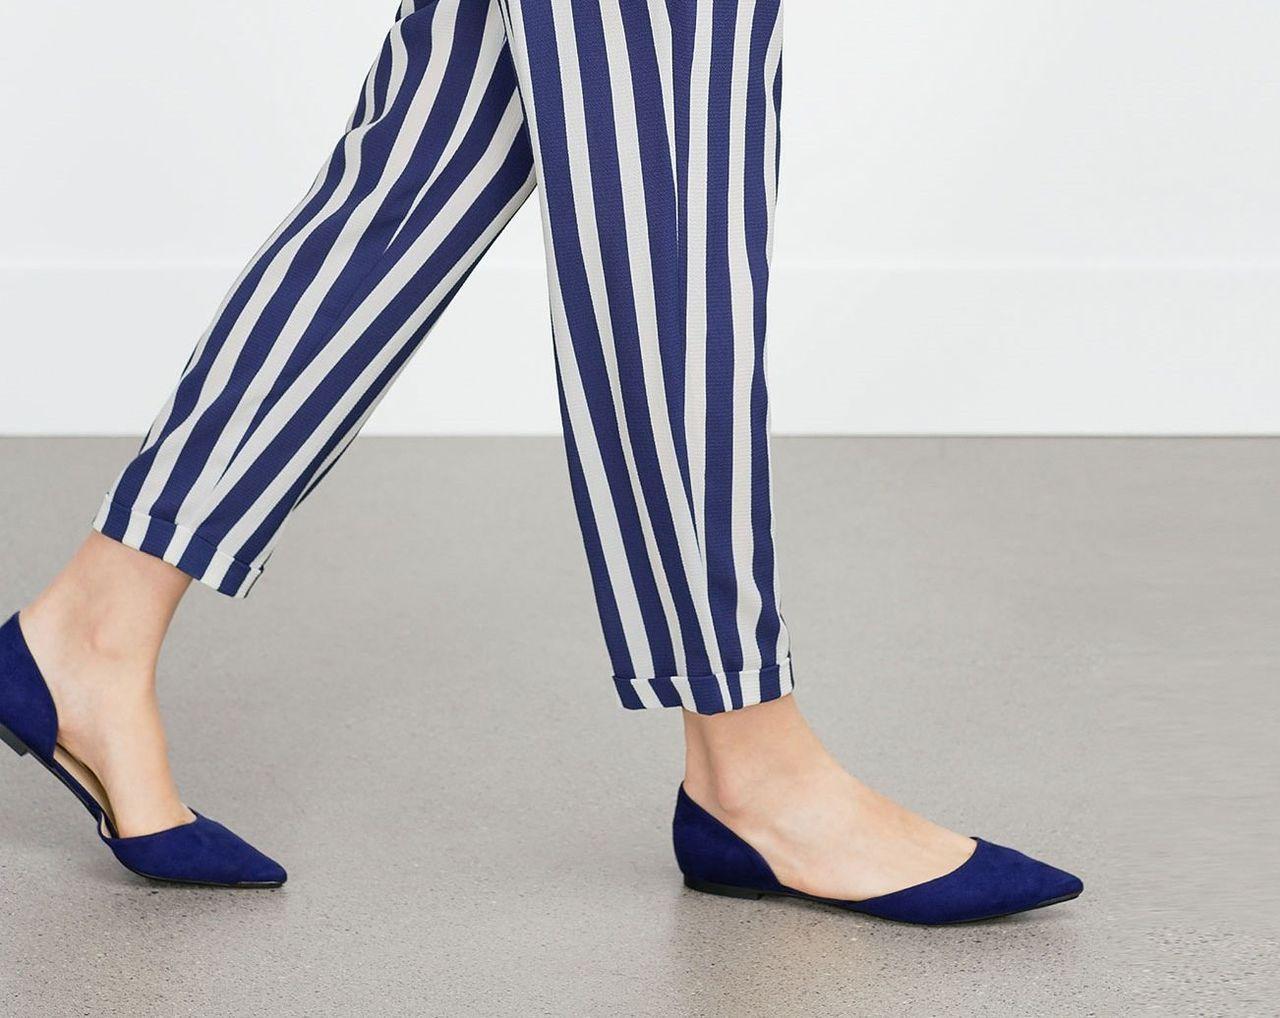 Zara Blue D'orsay Flat Shoes - Beautiful Wardrobe